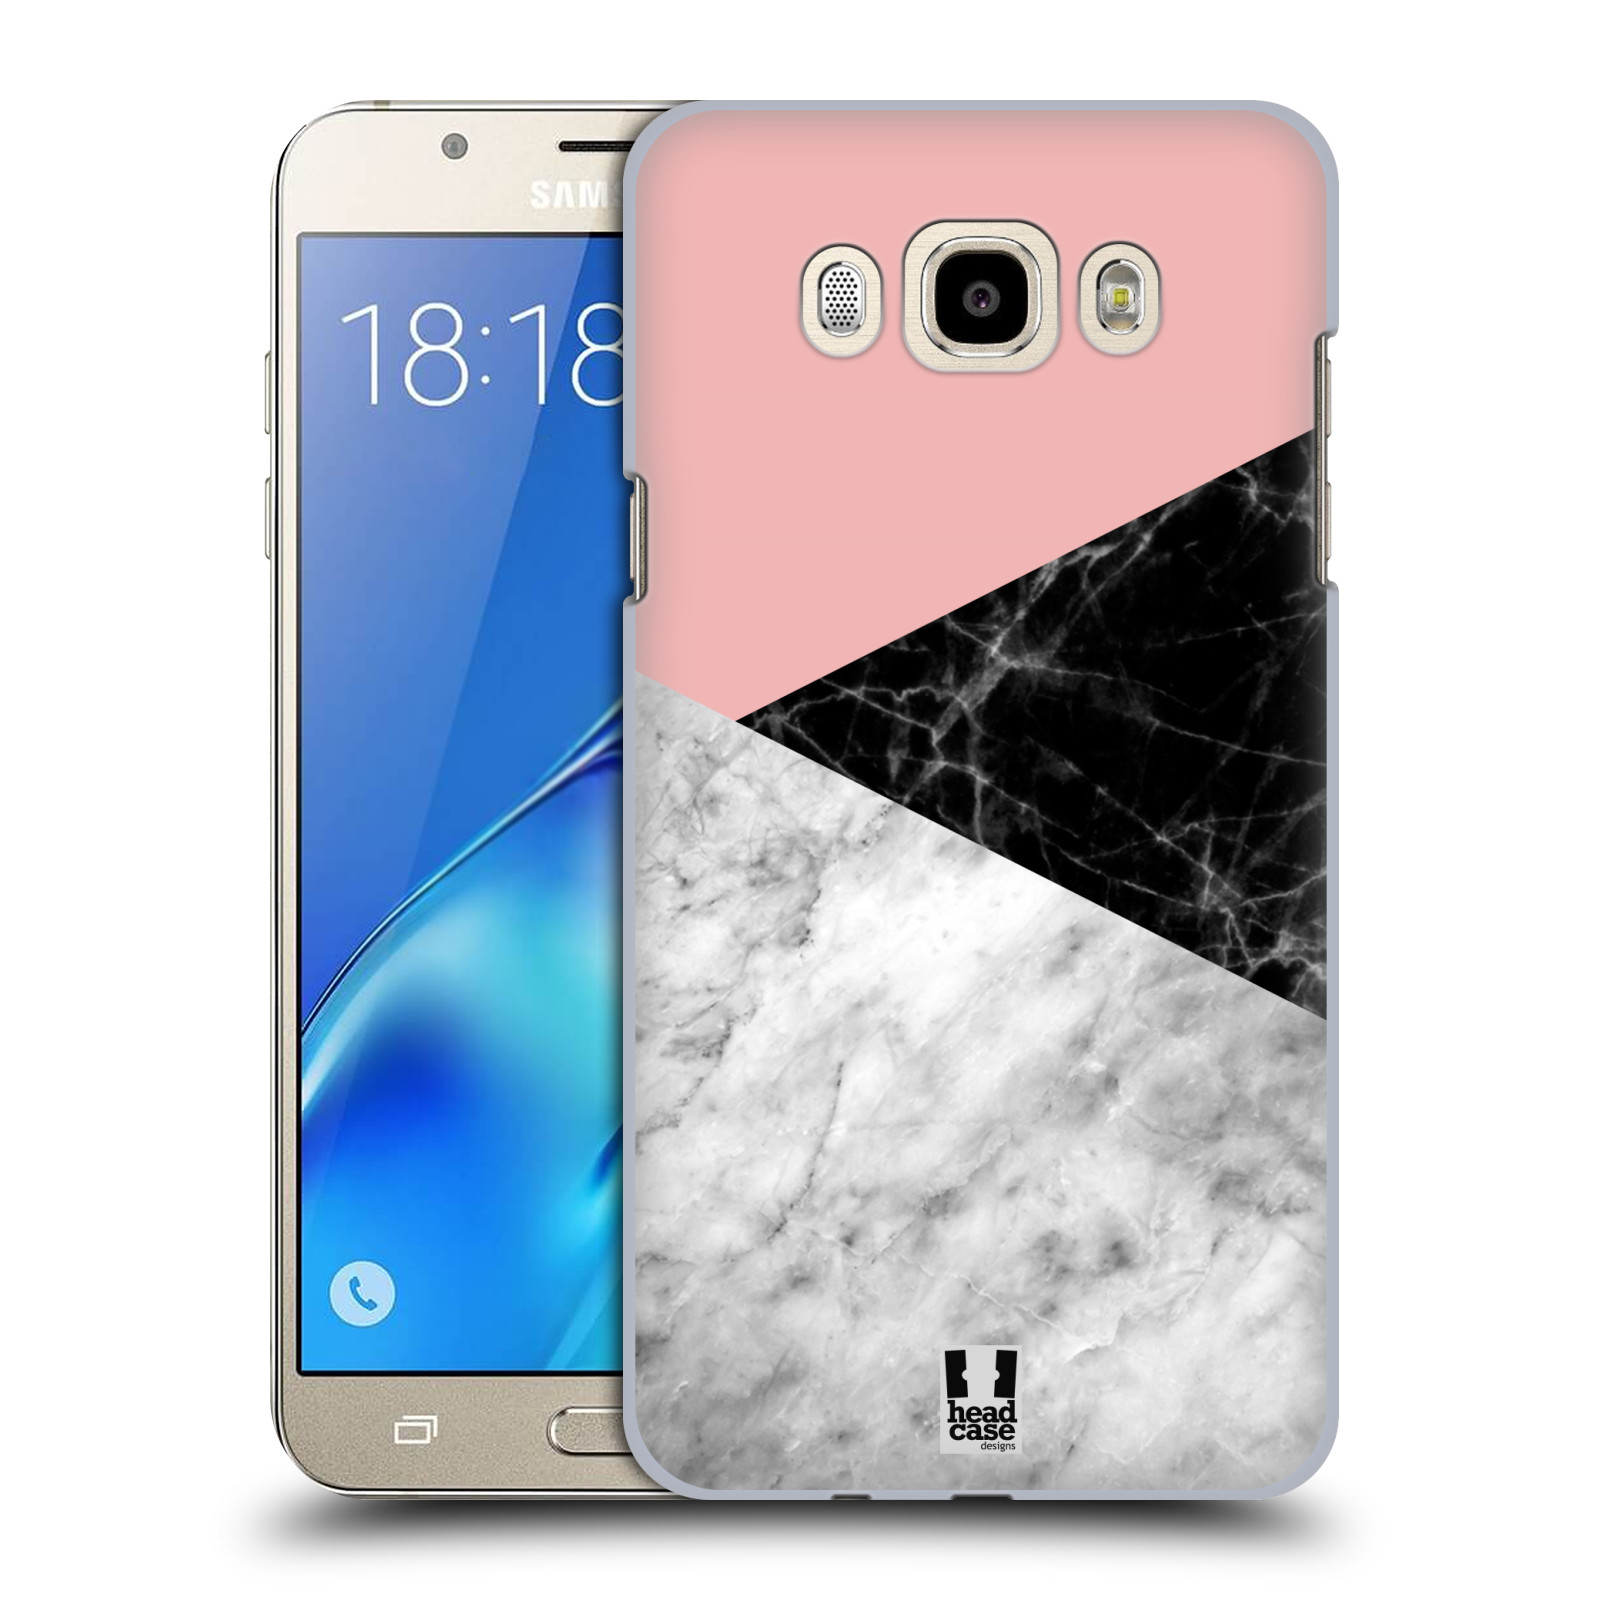 Plastové pouzdro na mobil Samsung Galaxy J7 (2016) - Head Case - Mramor mix